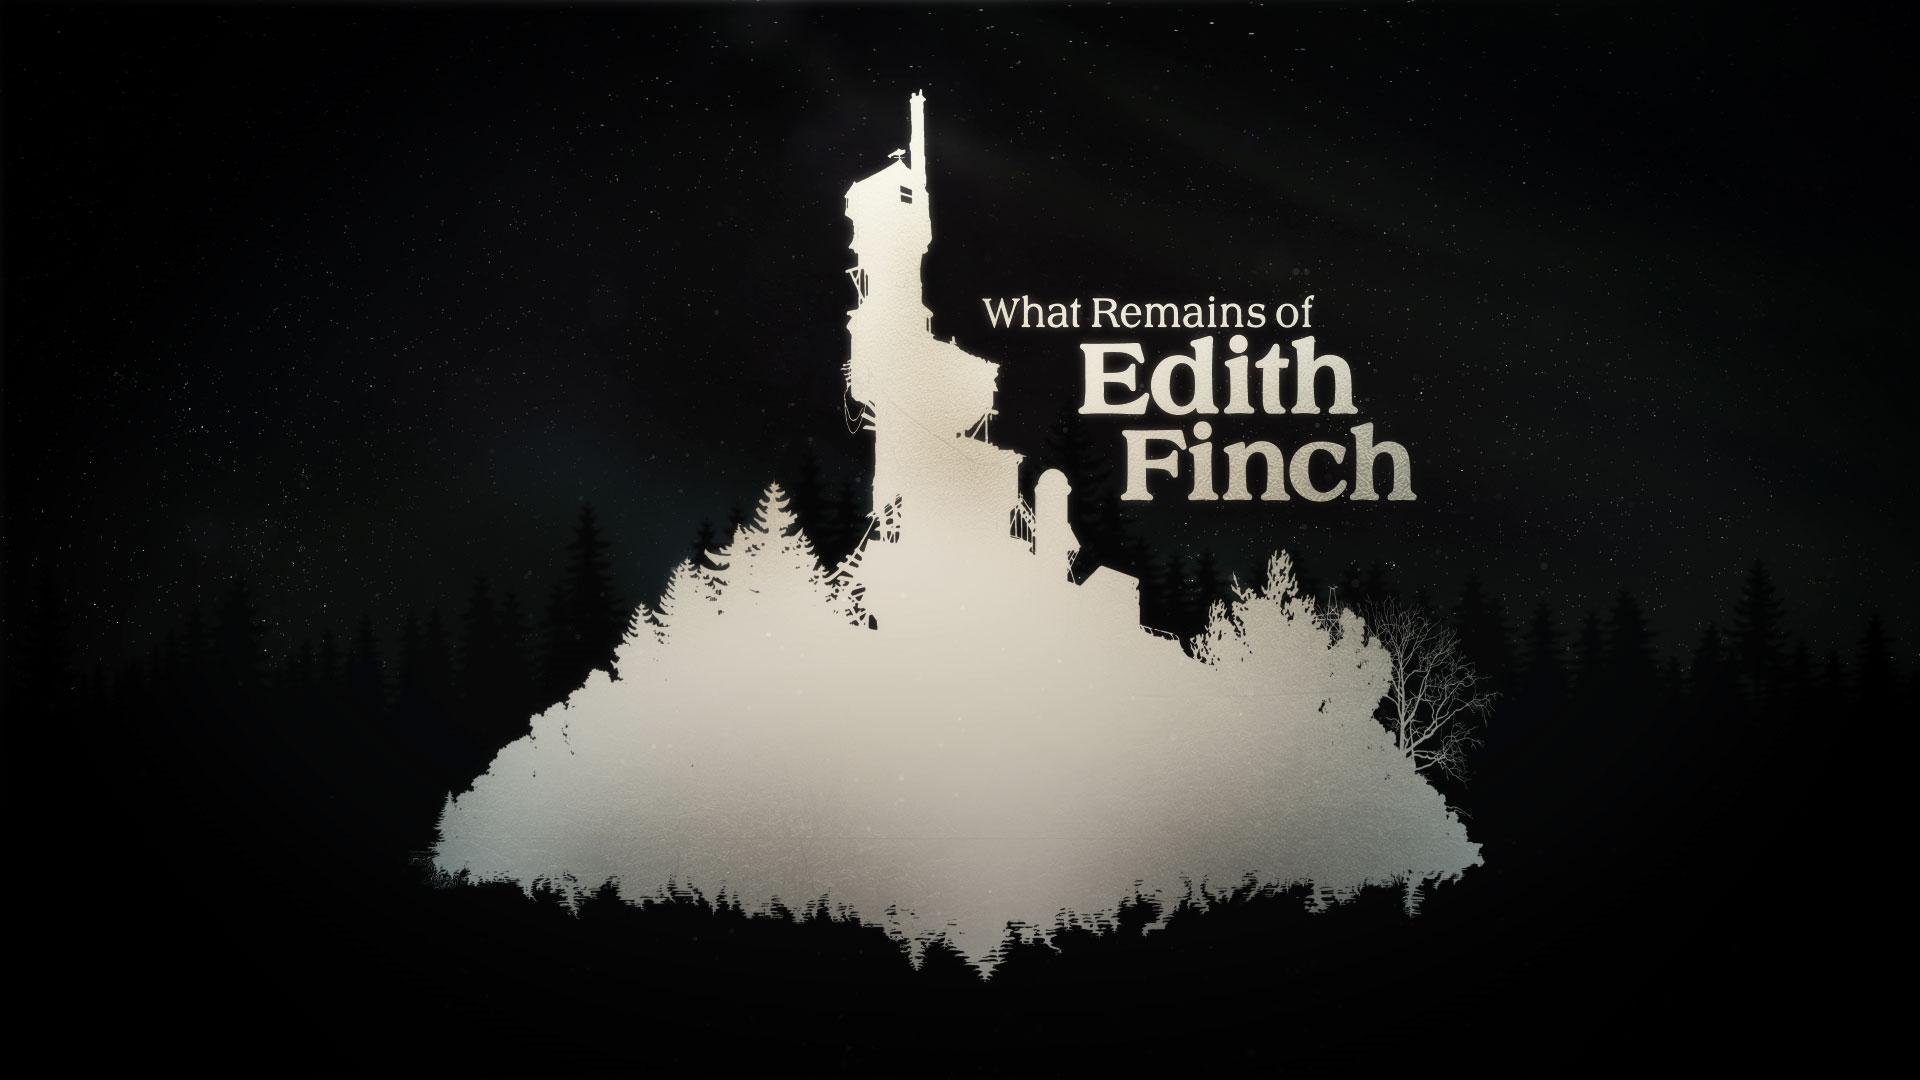 EdithFinch_2_15_J60.jpg